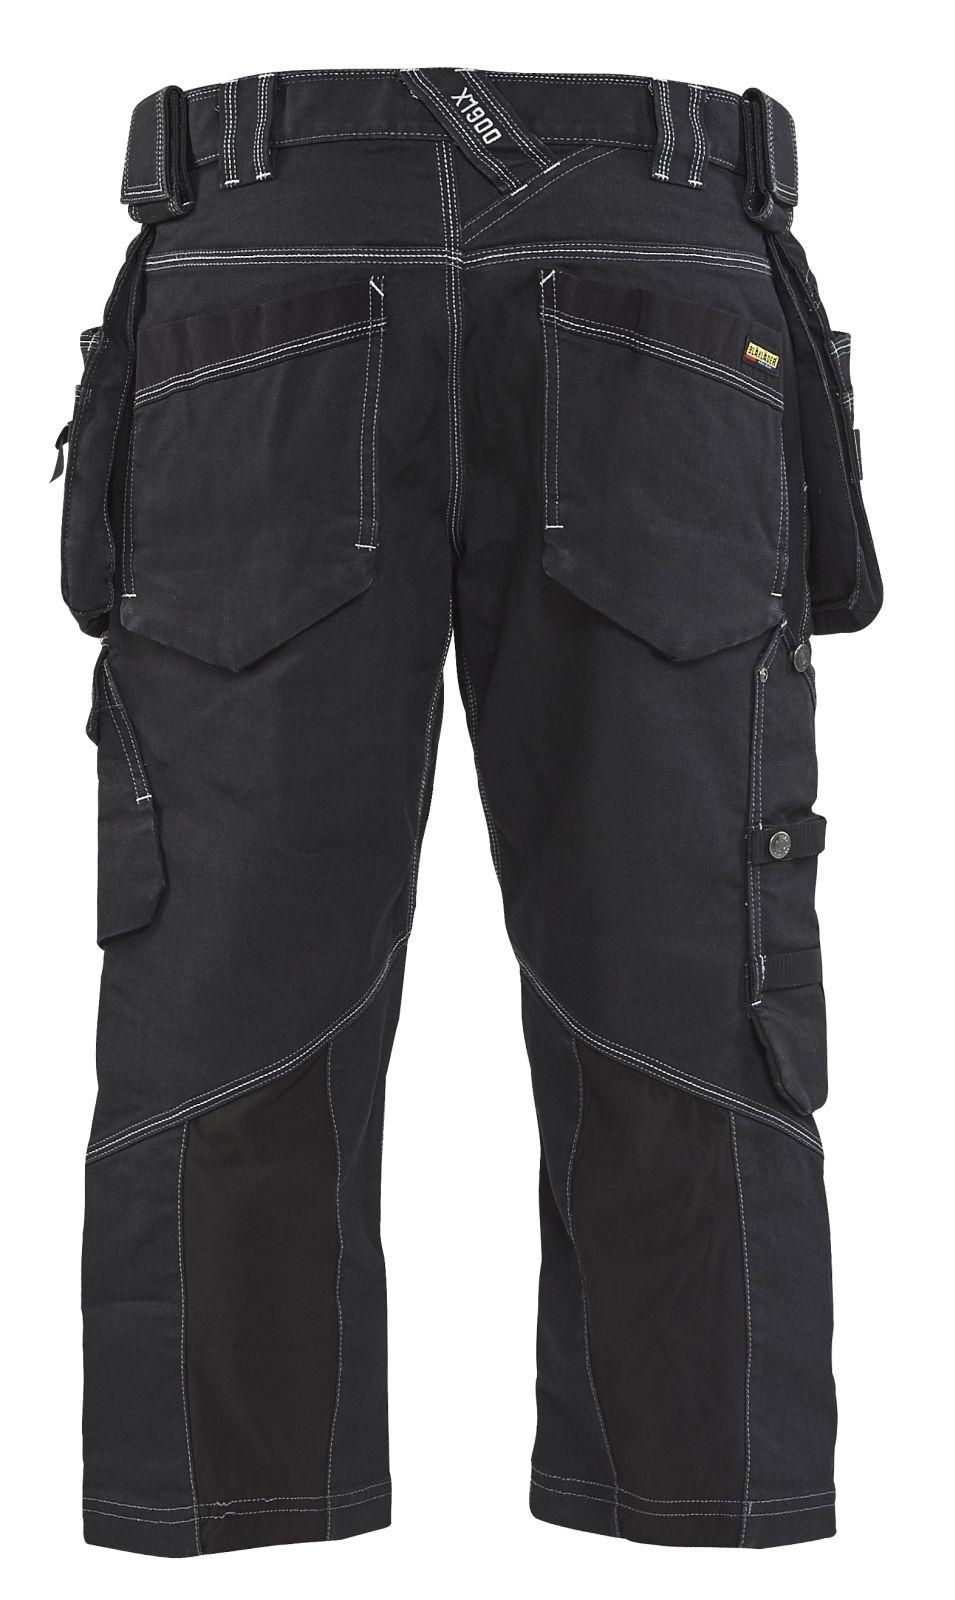 Blaklader Piraatbroeken 19911141 met Stretch zwart(9900)